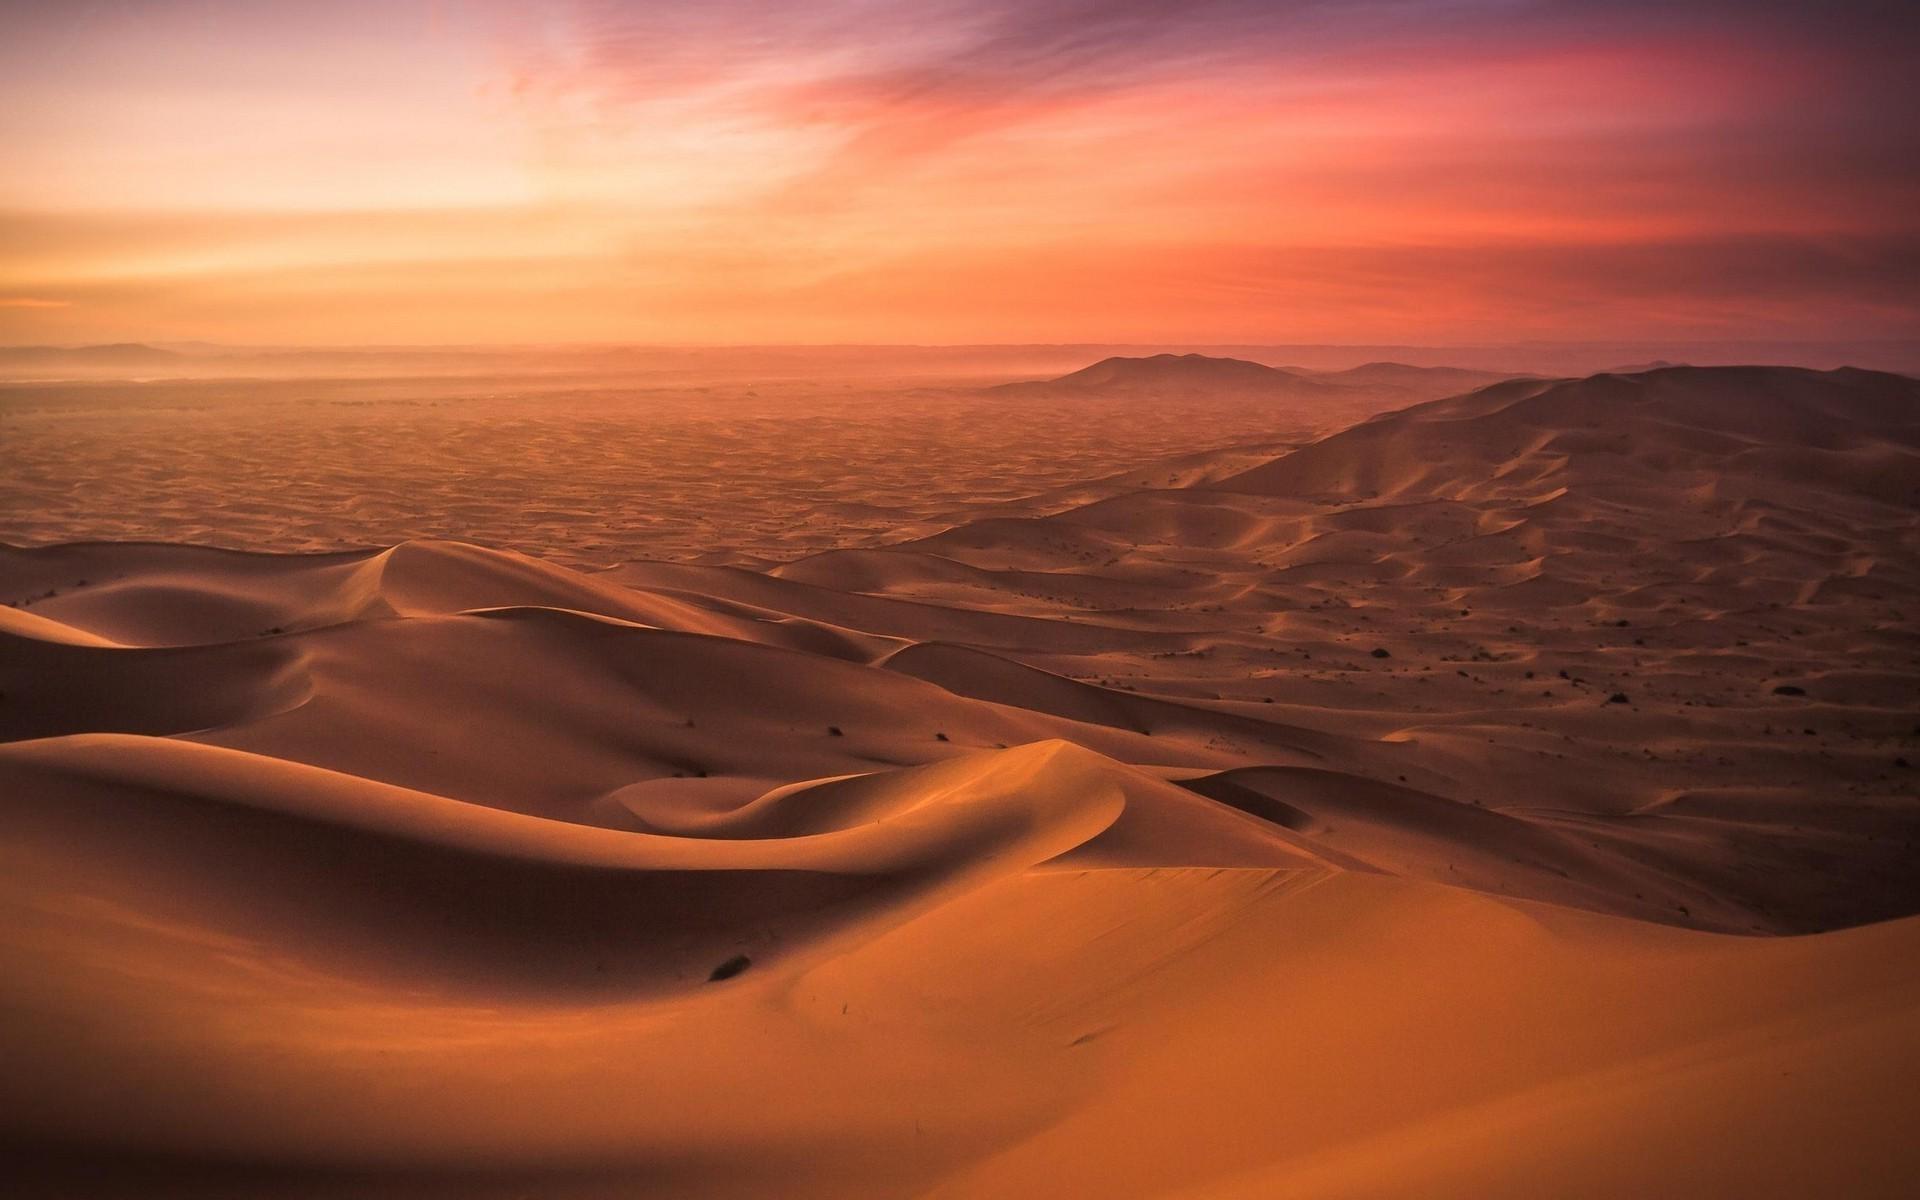 Res: 1920x1200, landscape, Nature, Morocco, Desert, Dune, Sunset